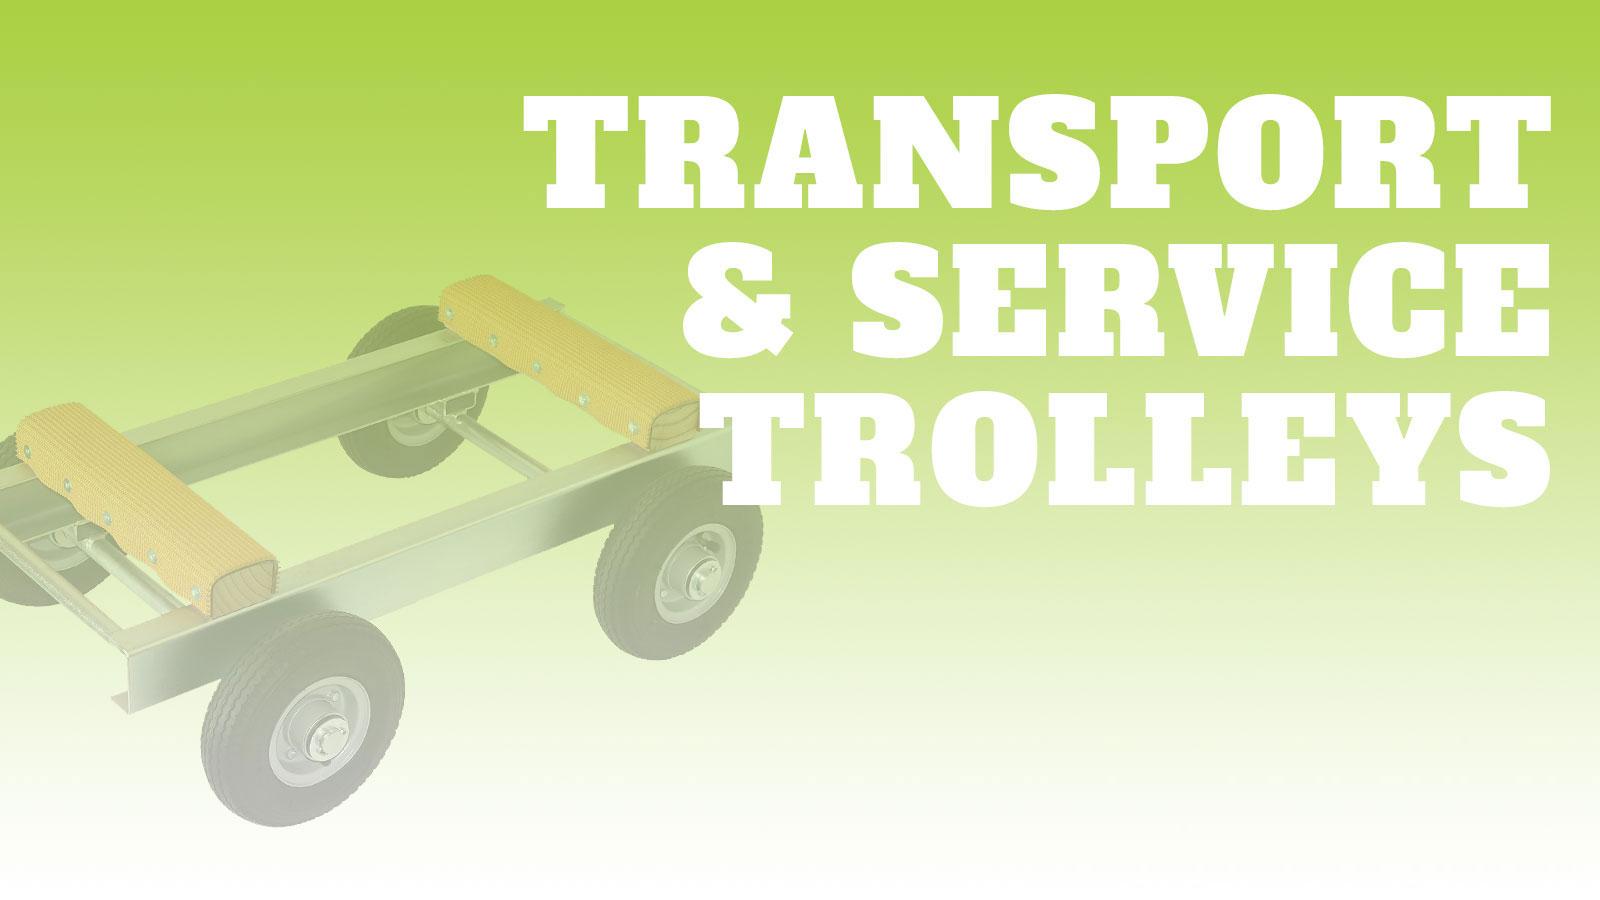 Warehouse-Transport-&-Service-1